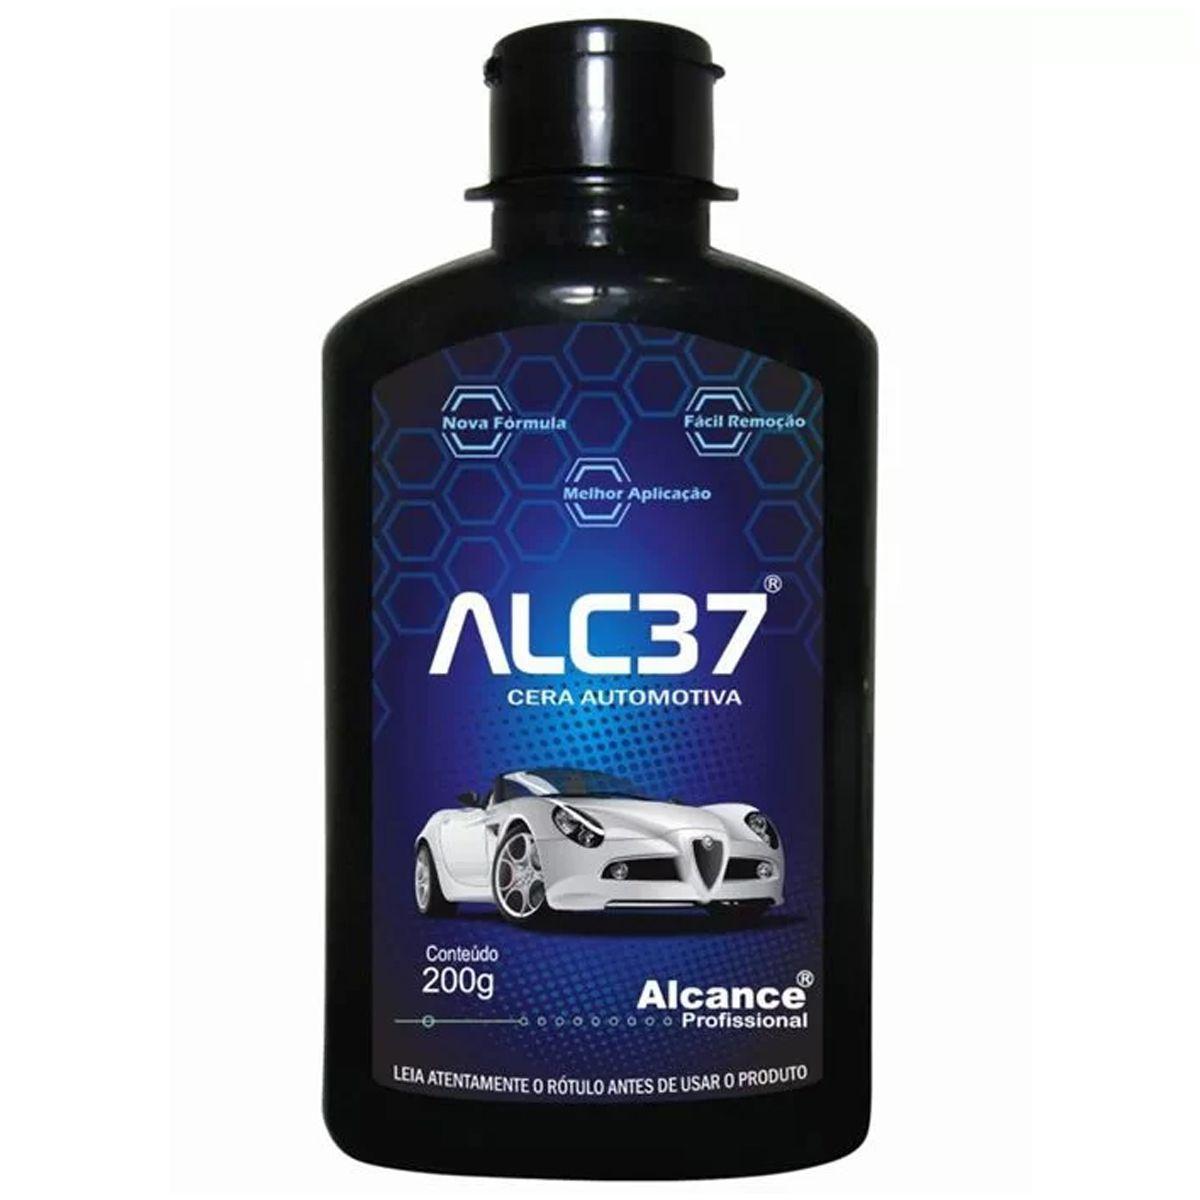 Cera Automotiva Alc37 200ml Alcance